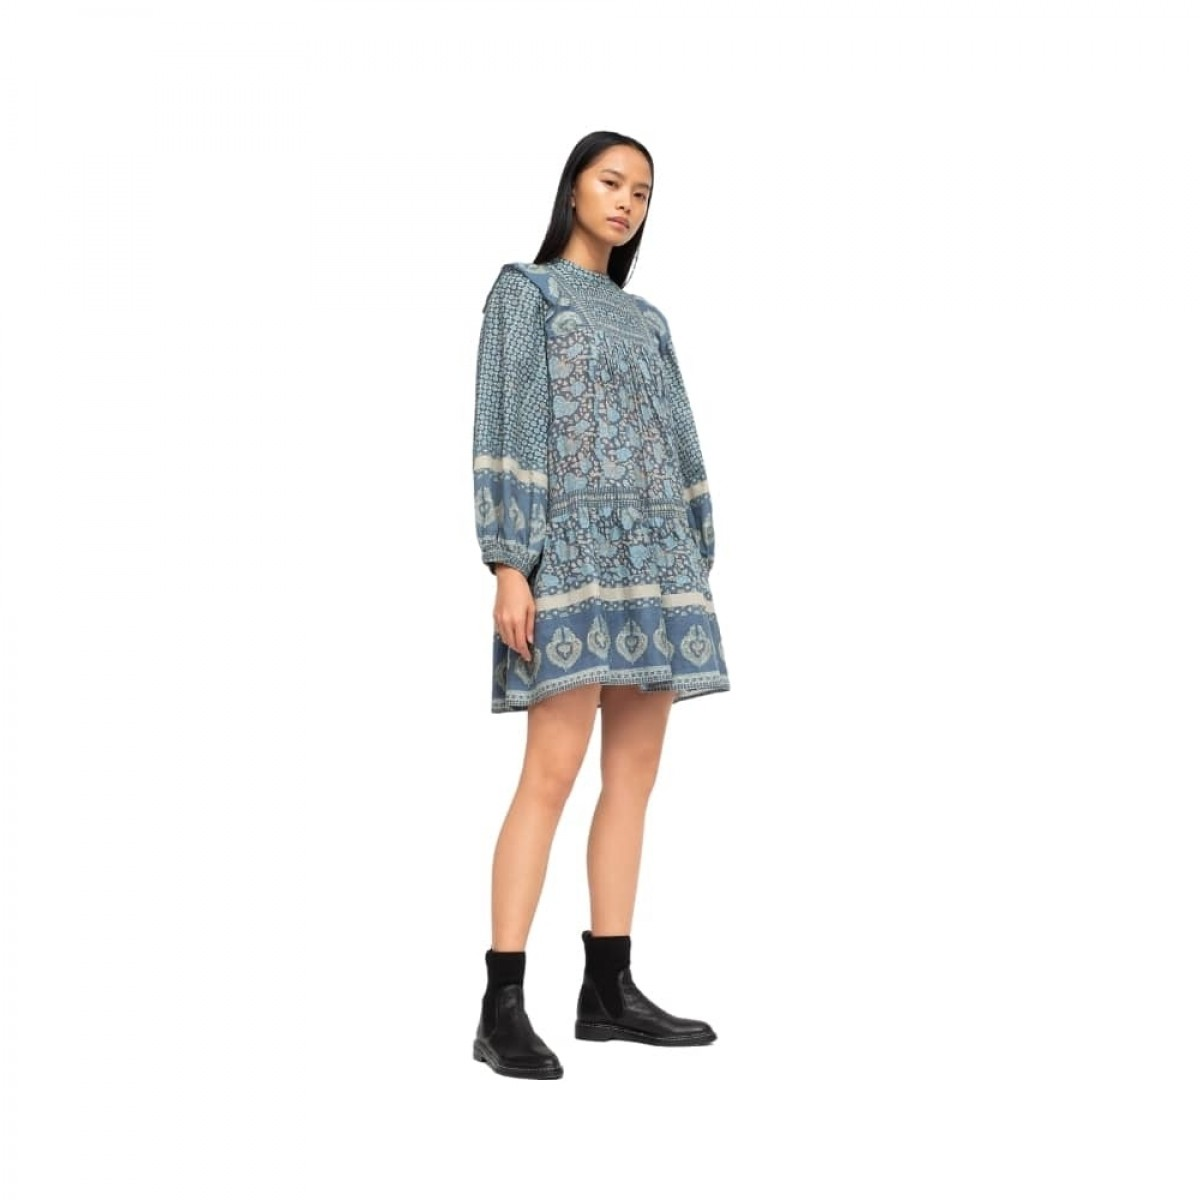 margo border tunic dress - ocean